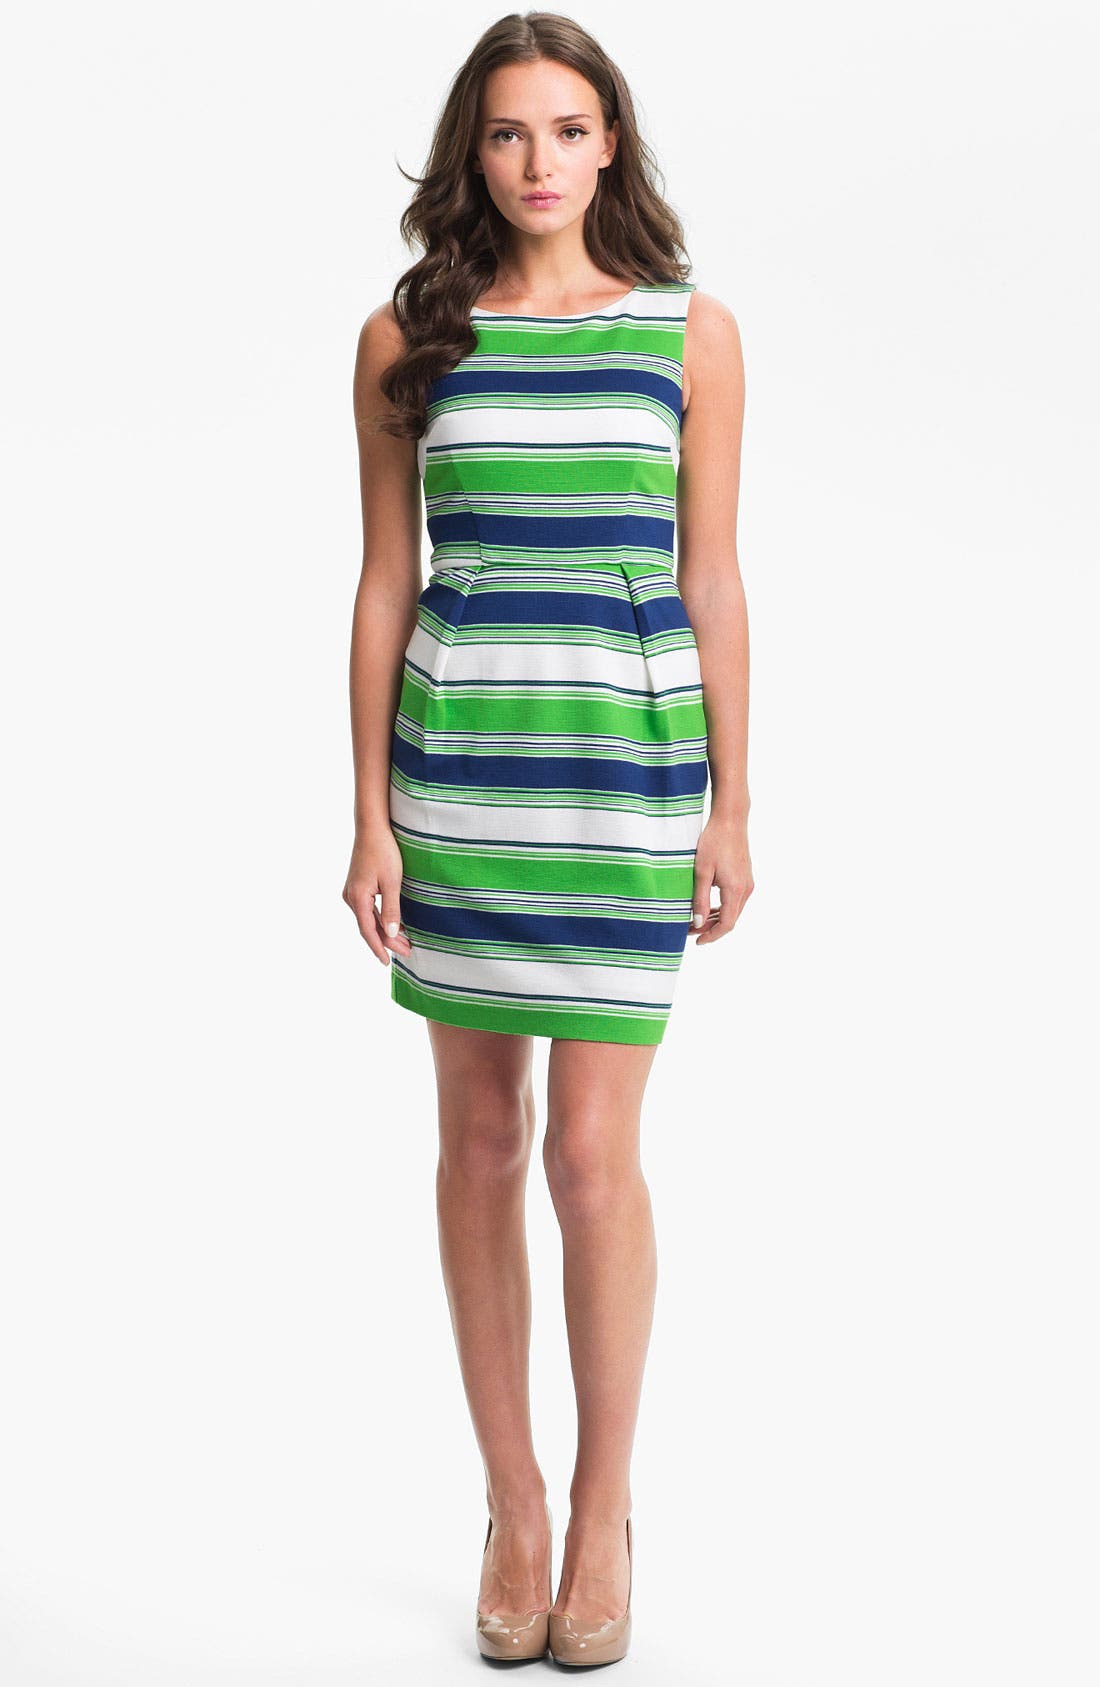 Alternate Image 1 Selected - Trina Turk 'Spectator' Stripe Ponte Sheath Dress